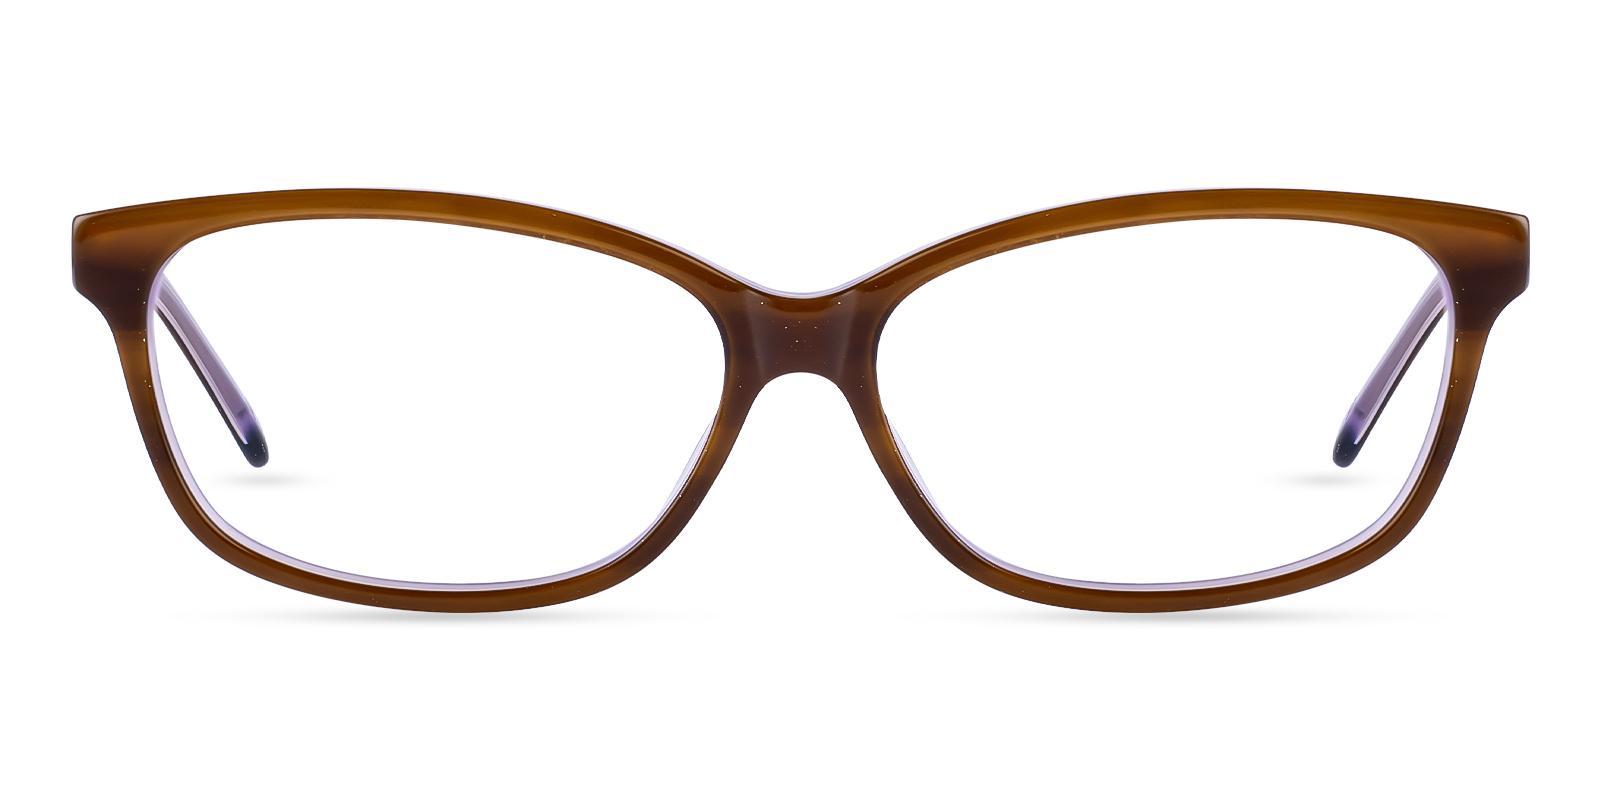 Levant Brown Acetate Eyeglasses , SpringHinges , UniversalBridgeFit Frames from ABBE Glasses